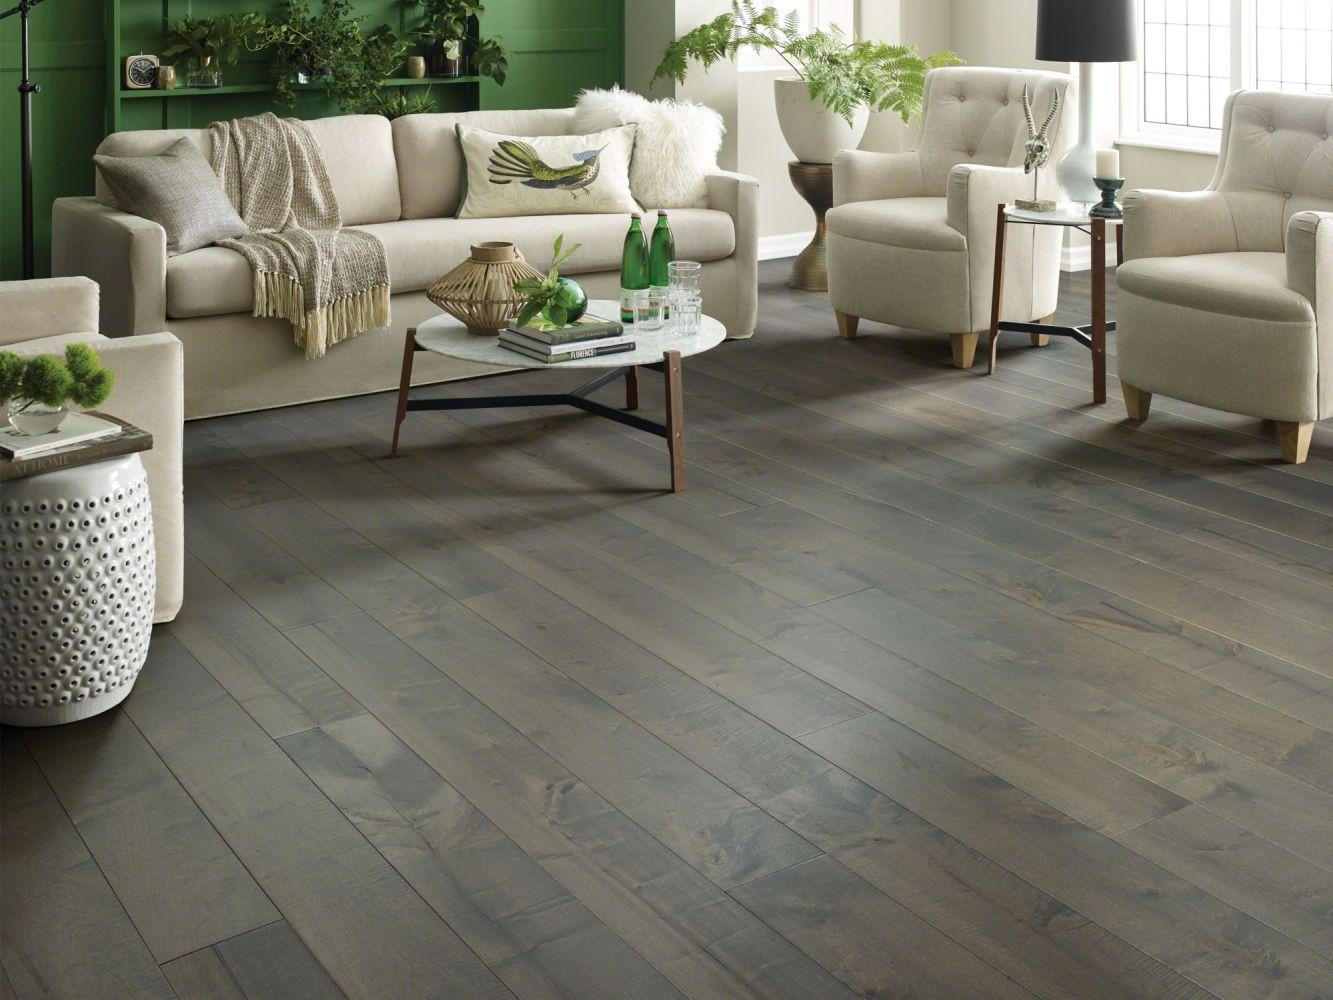 Shaw Floors Repel Hardwood Inspirations Maple Serenity 09019_212SA